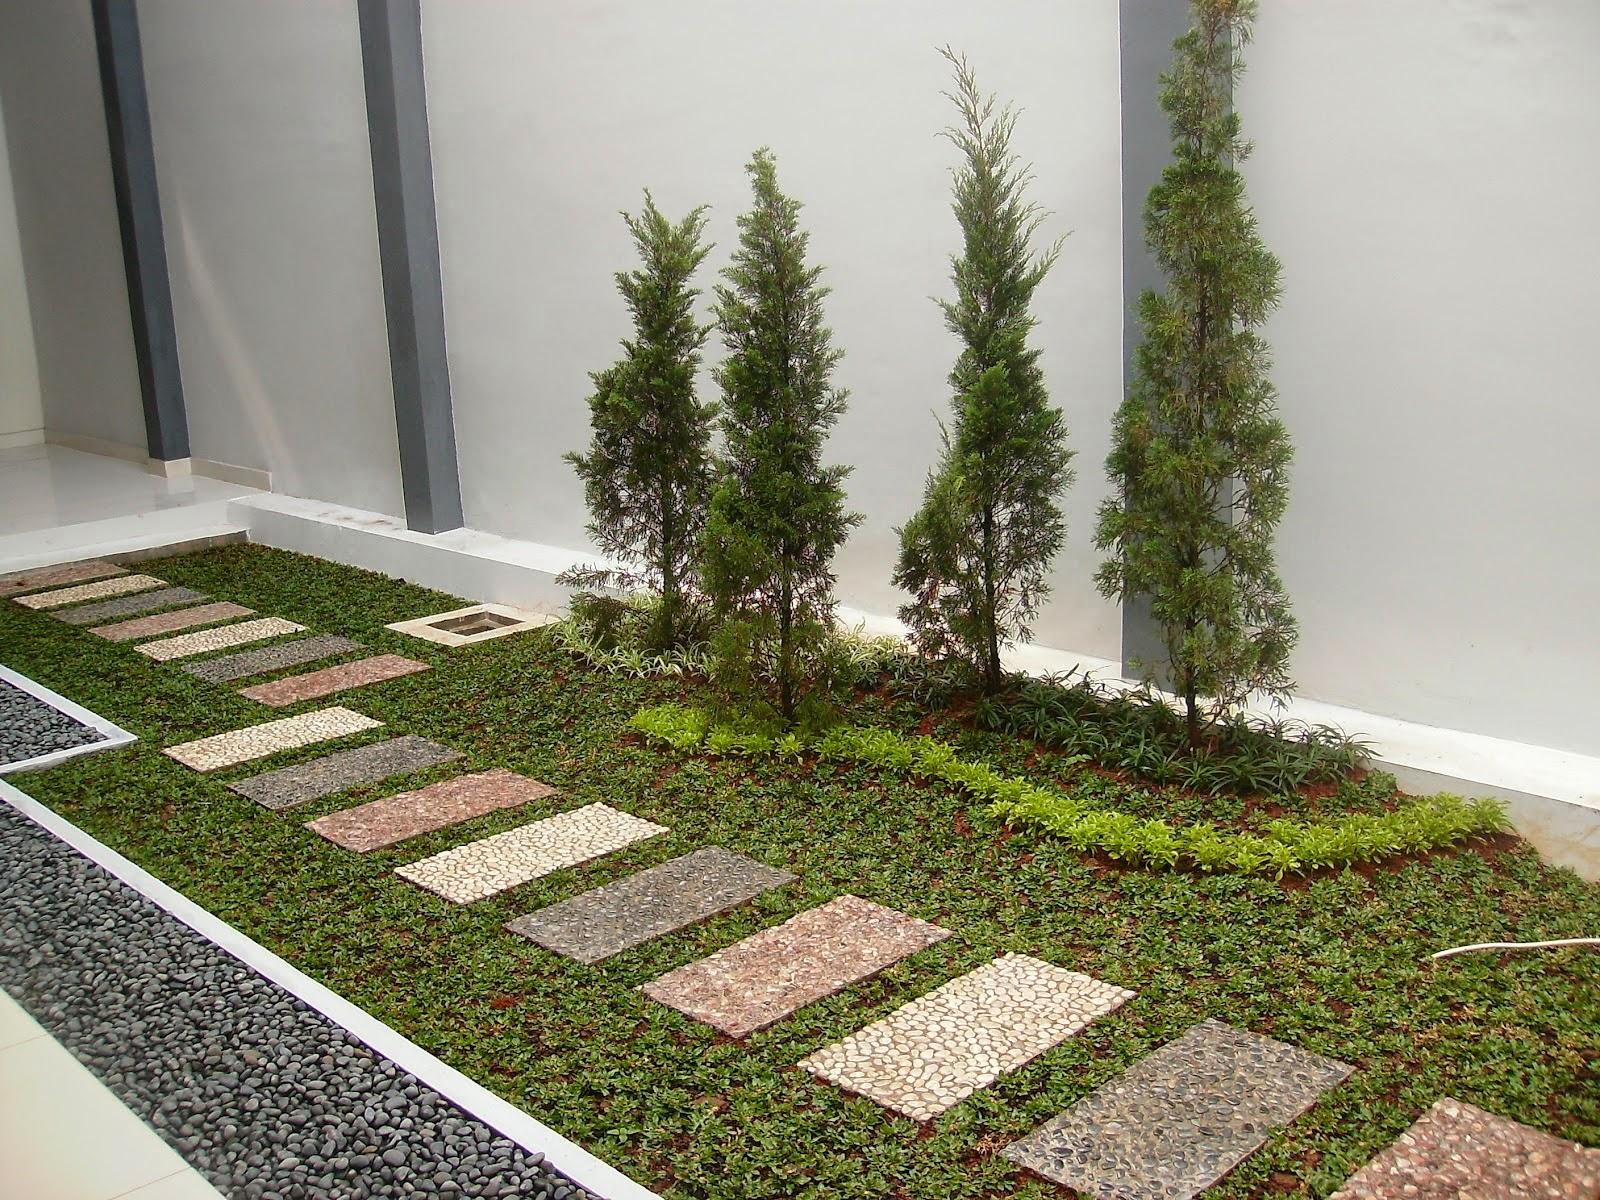 Tukang taman murah | Renovasi taman | Suplier tanaman hias | Saung gazebo | Kolam minimalis | Rumput